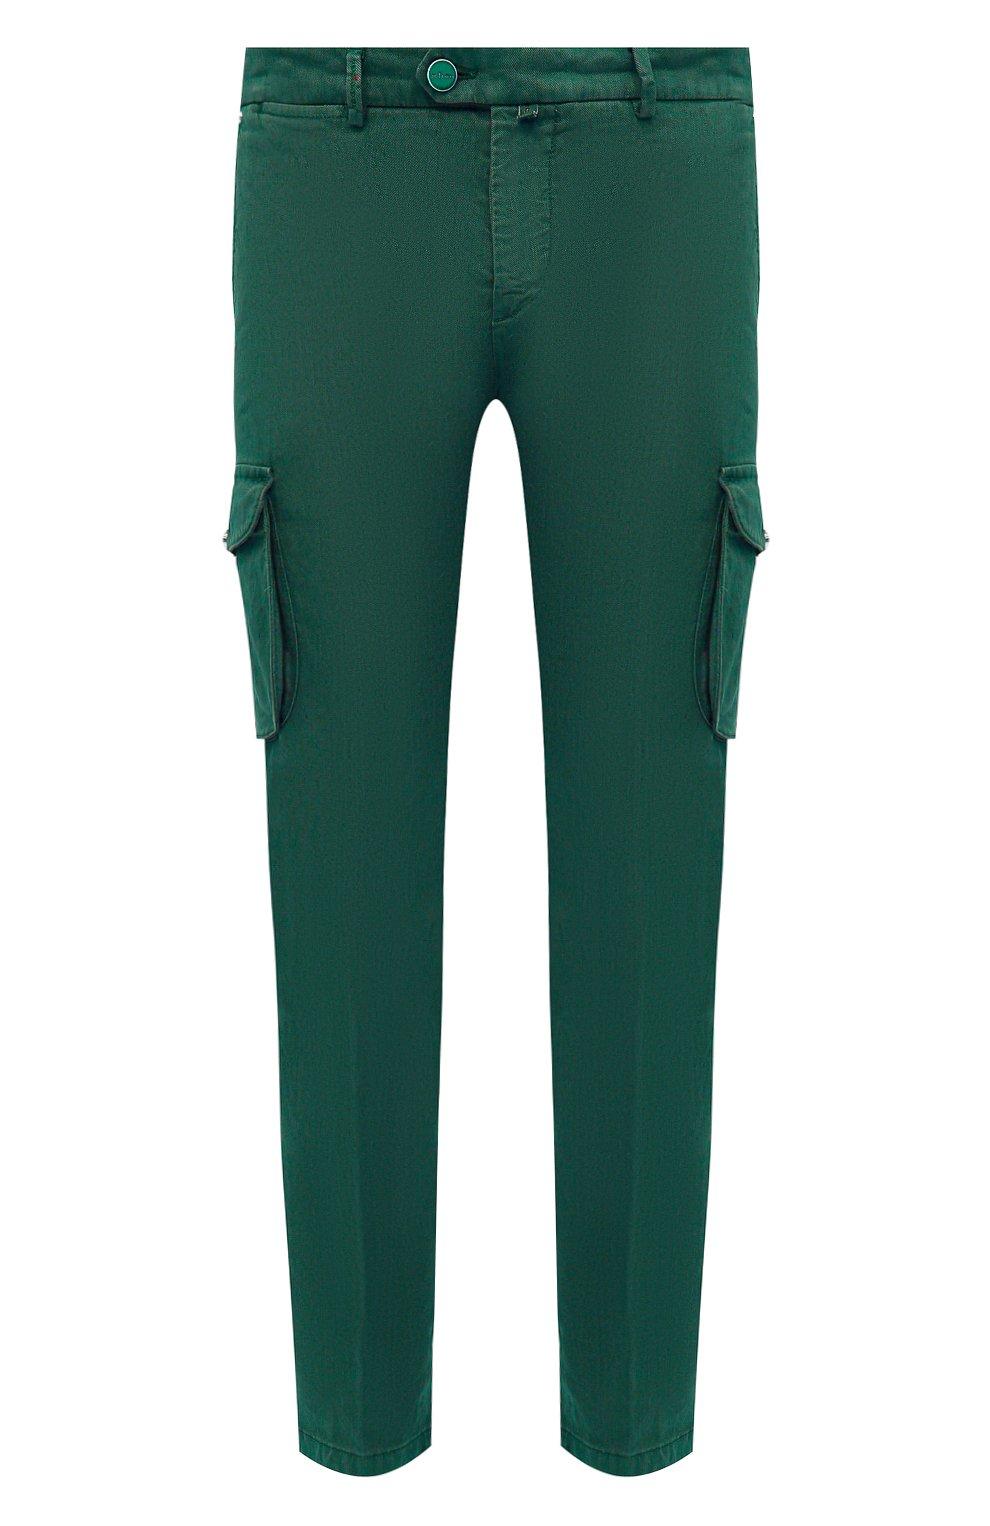 Мужские брюки-карго изо льна и хлопка KITON зеленого цвета, арт. UFPPCAJ07T38   Фото 1